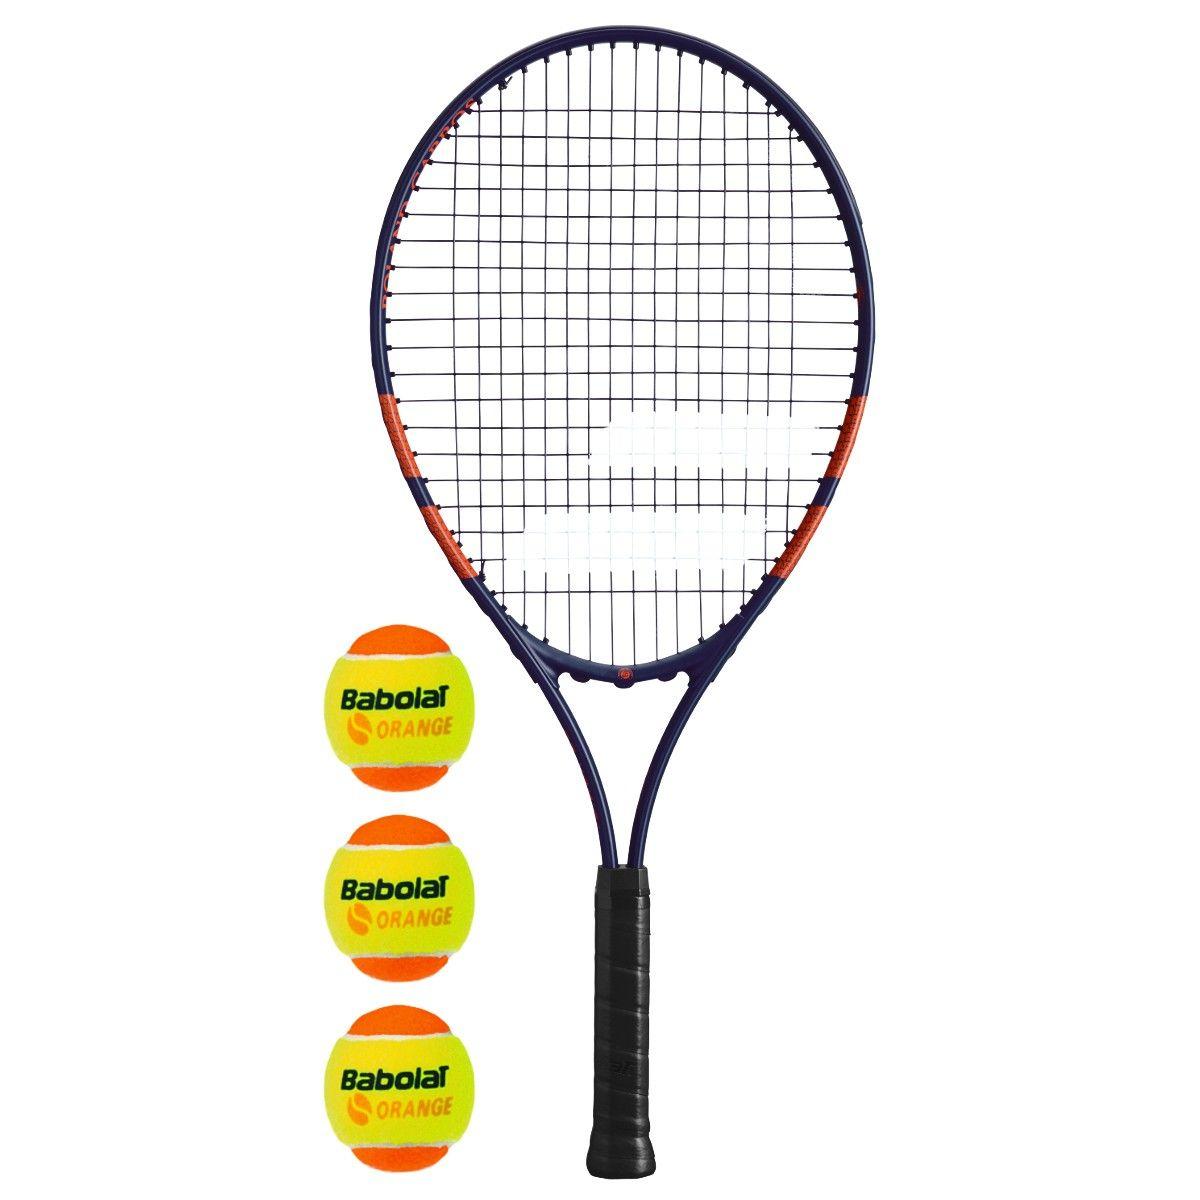 Raquette de tennis enfant Babolat 25 Roland-Garros (tennispro.fr)